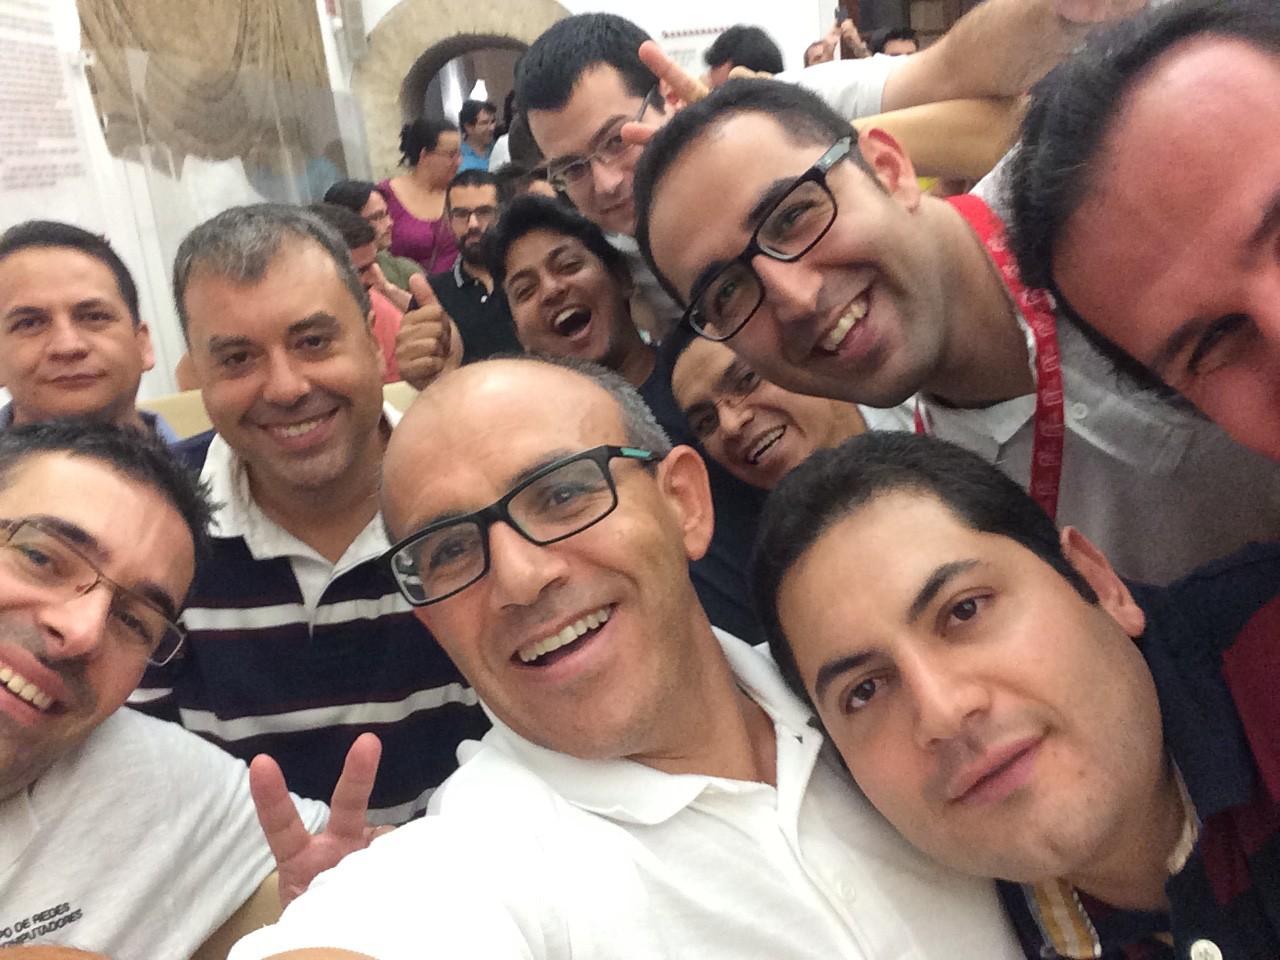 Jornadas' Selfie